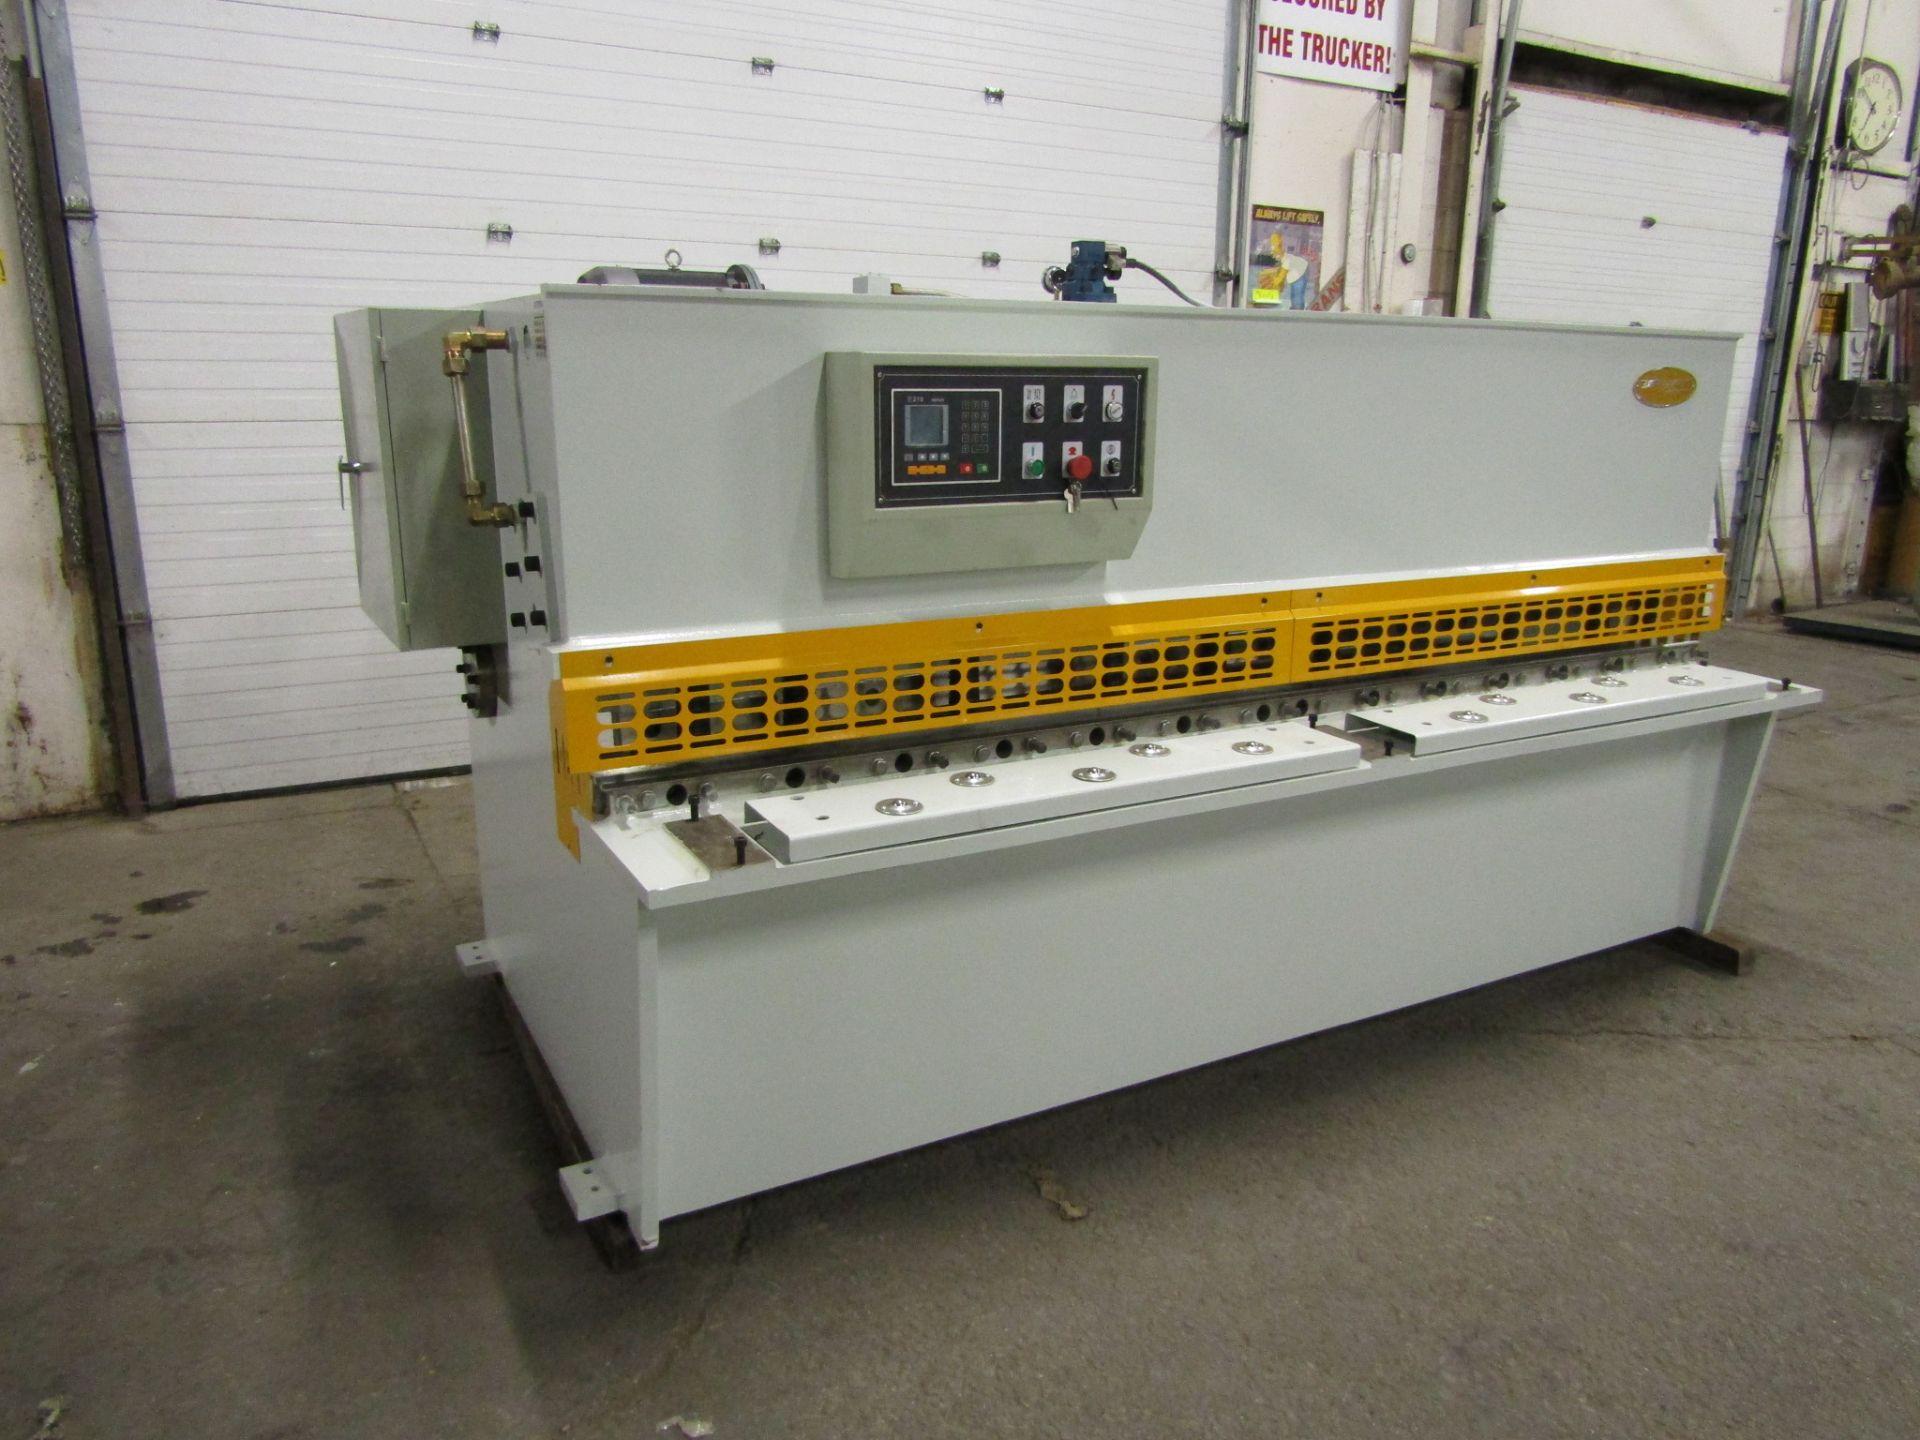 "Bernardo Hydraulic Shear 3/16"" max capacity 98"" width - 480/575V 3 phase MINT UNUSED UNIT complete"